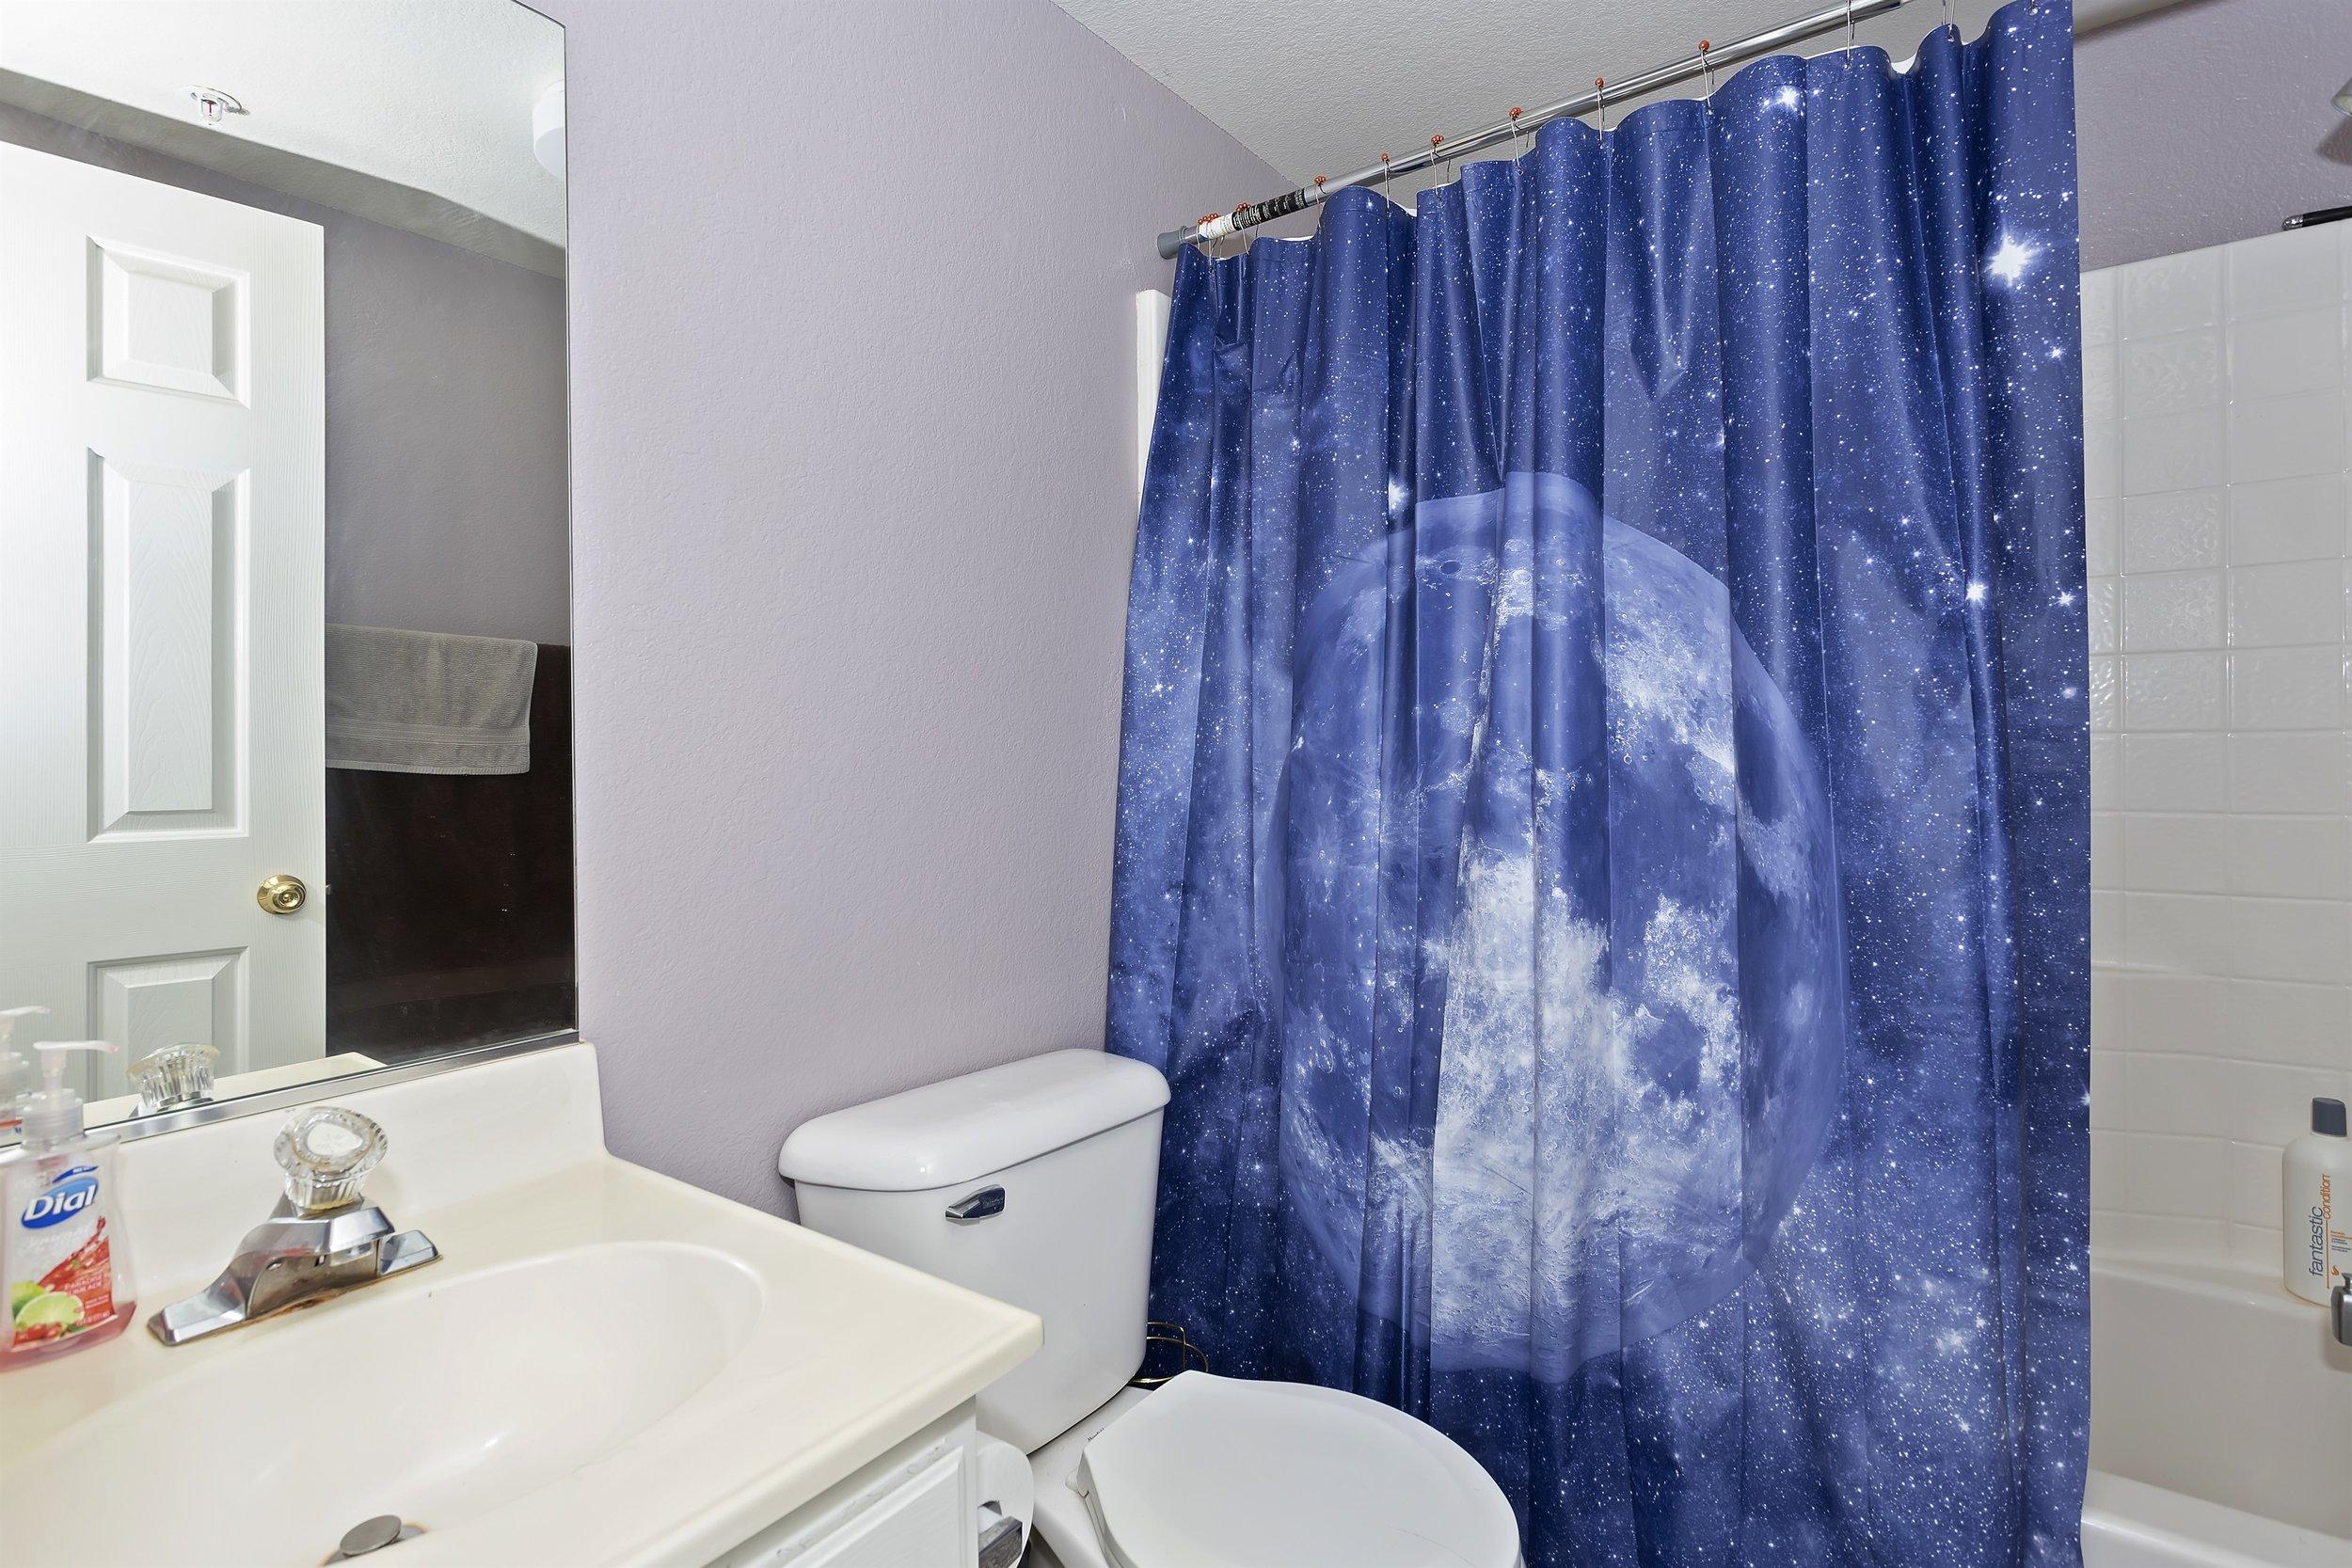 021_2nd Floor Bathroom.jpg